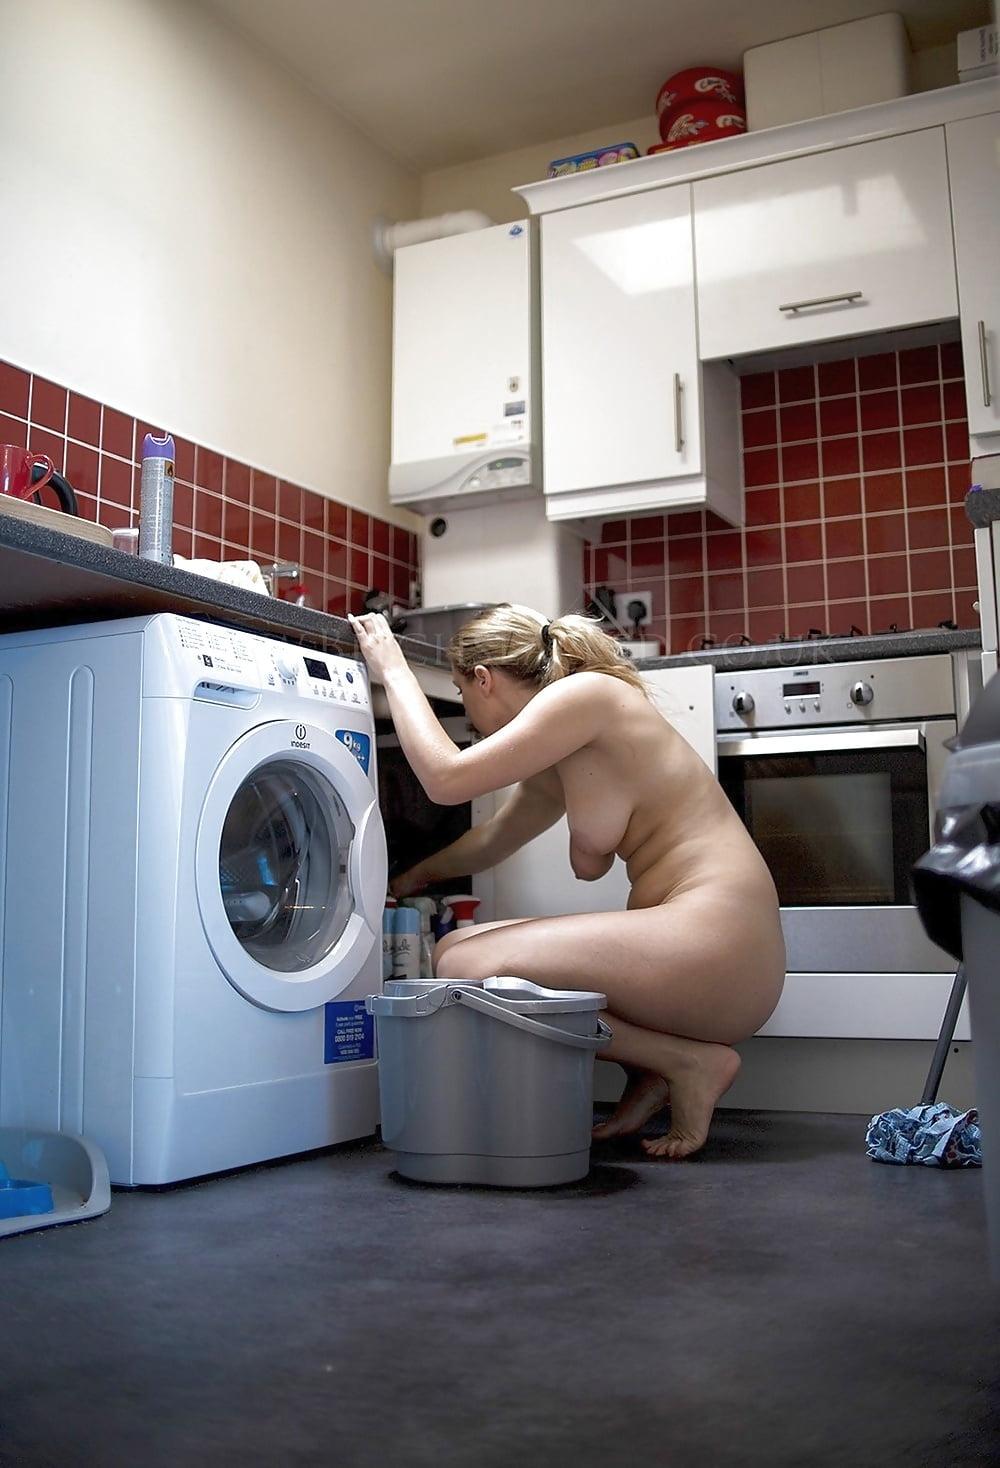 sullivan-nude-cleaning-women-naked-junior